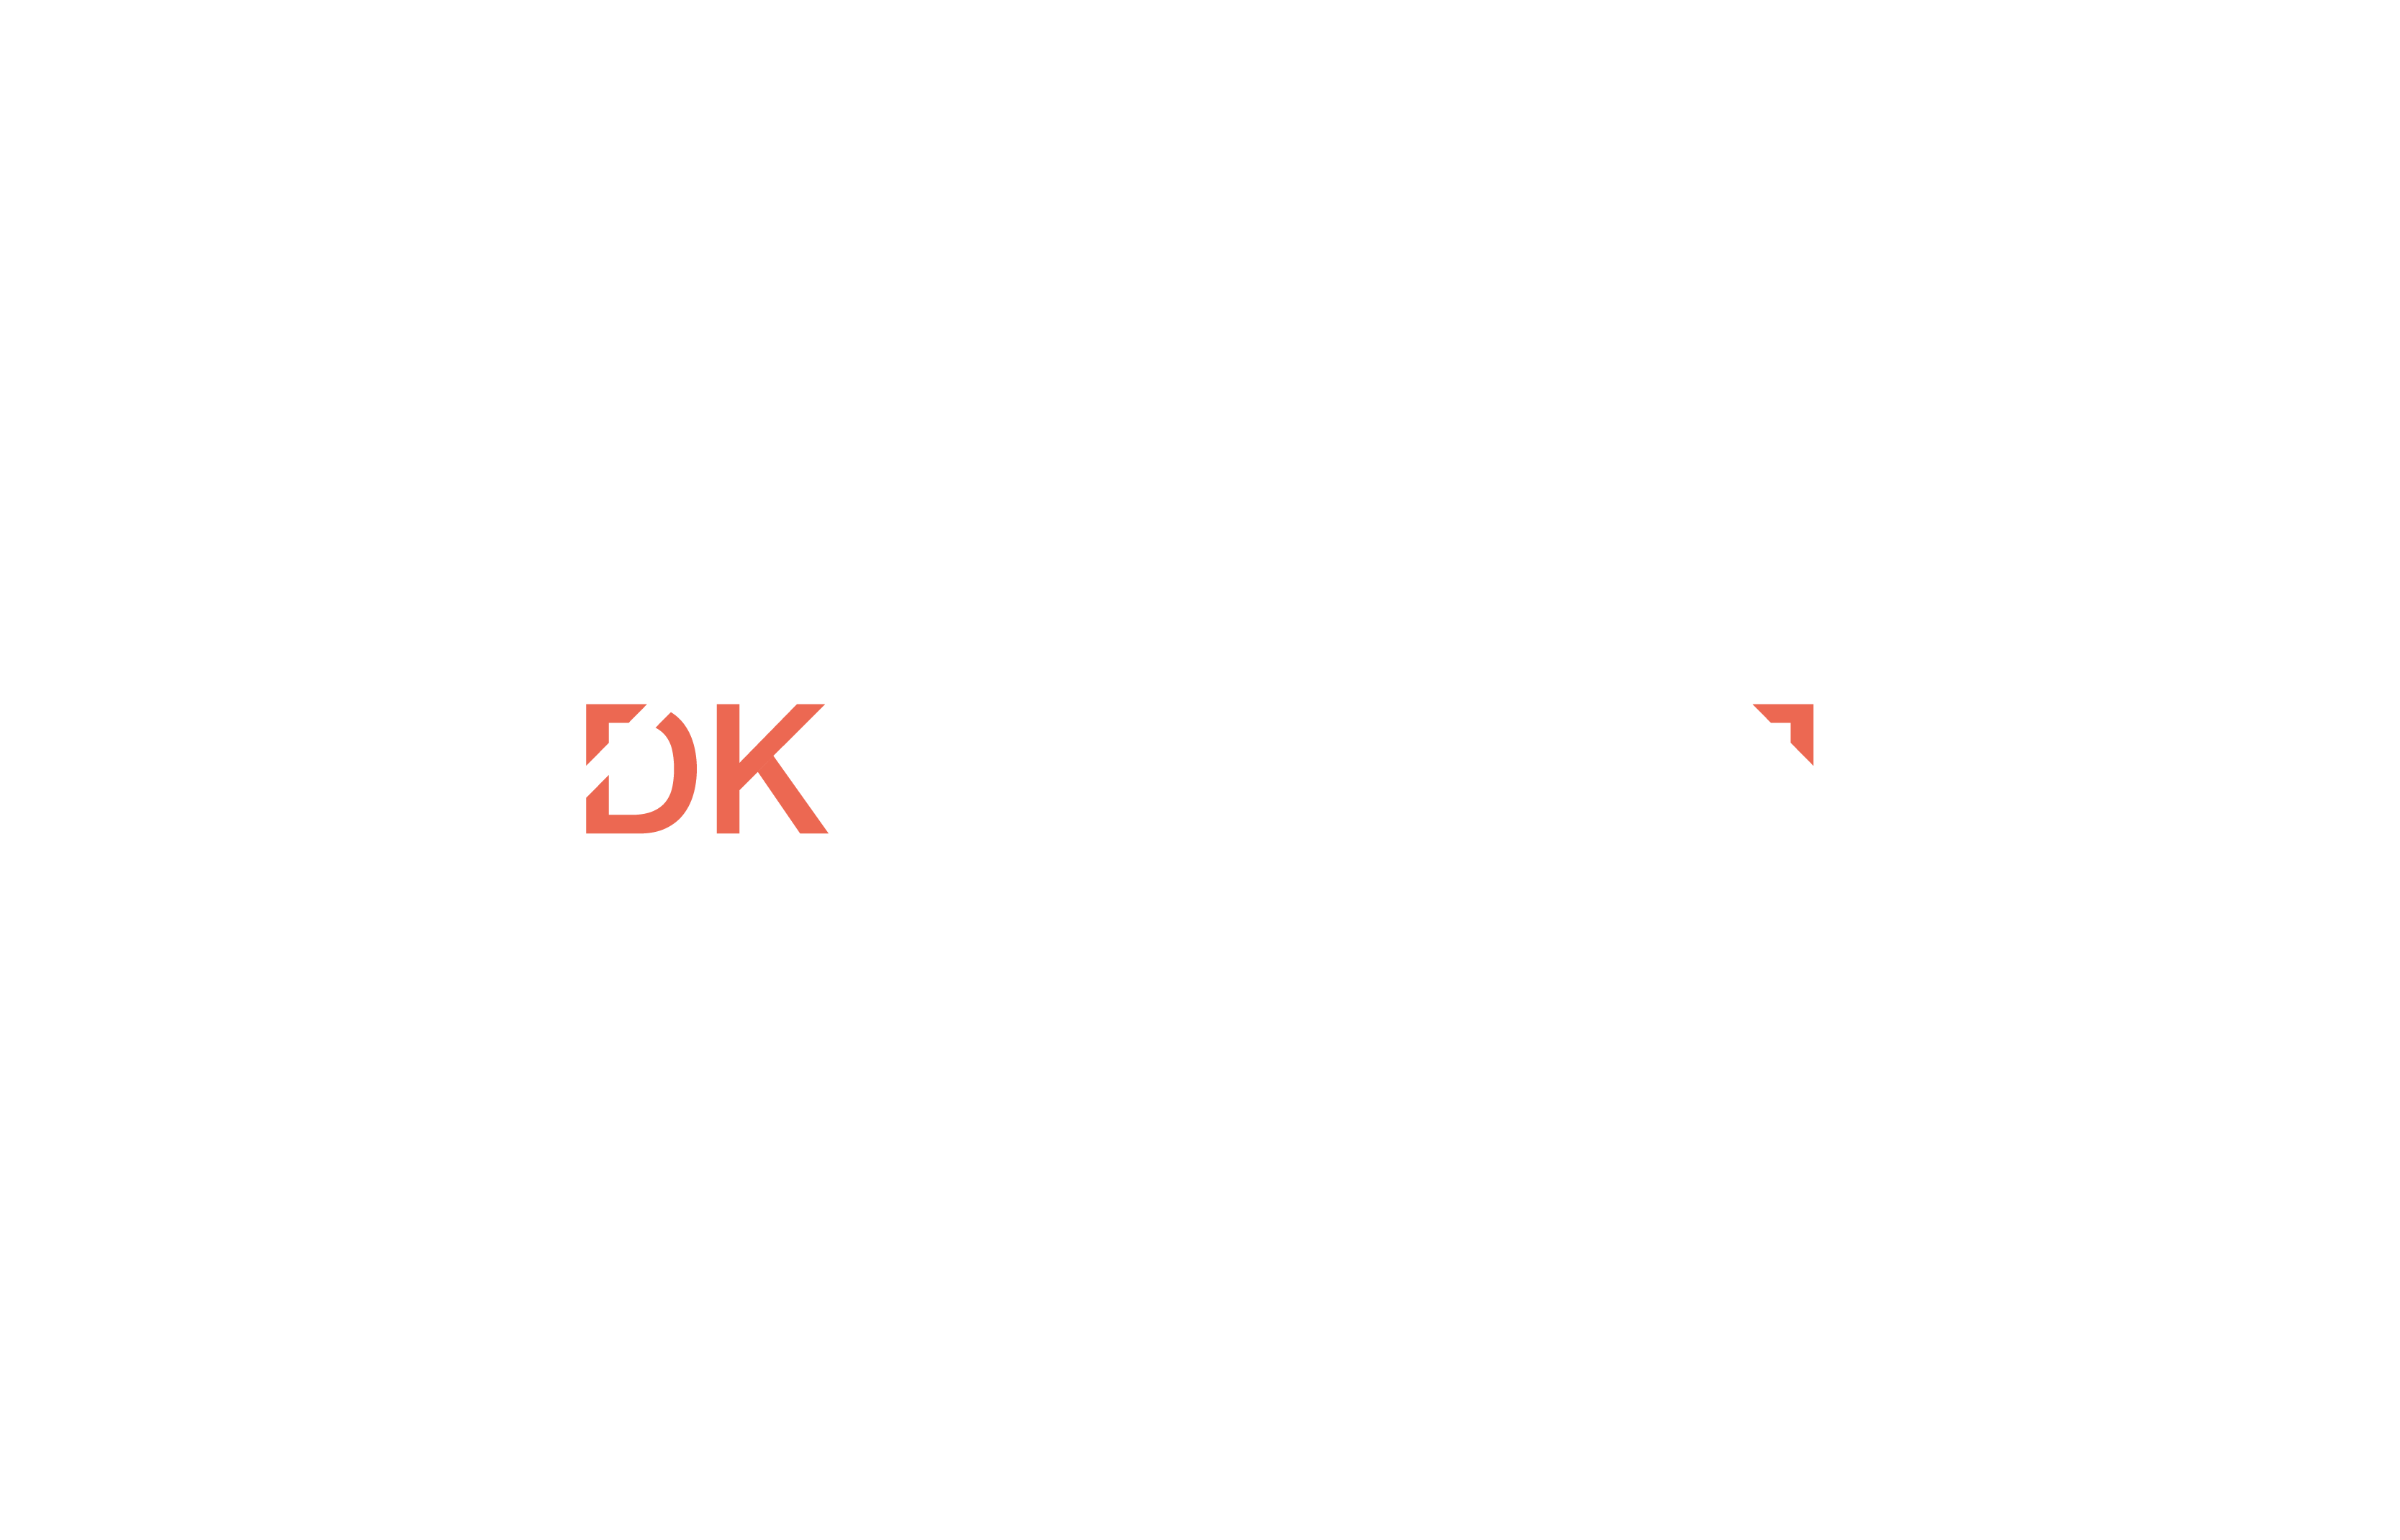 dk-transparant-studiosont_dk-zwart